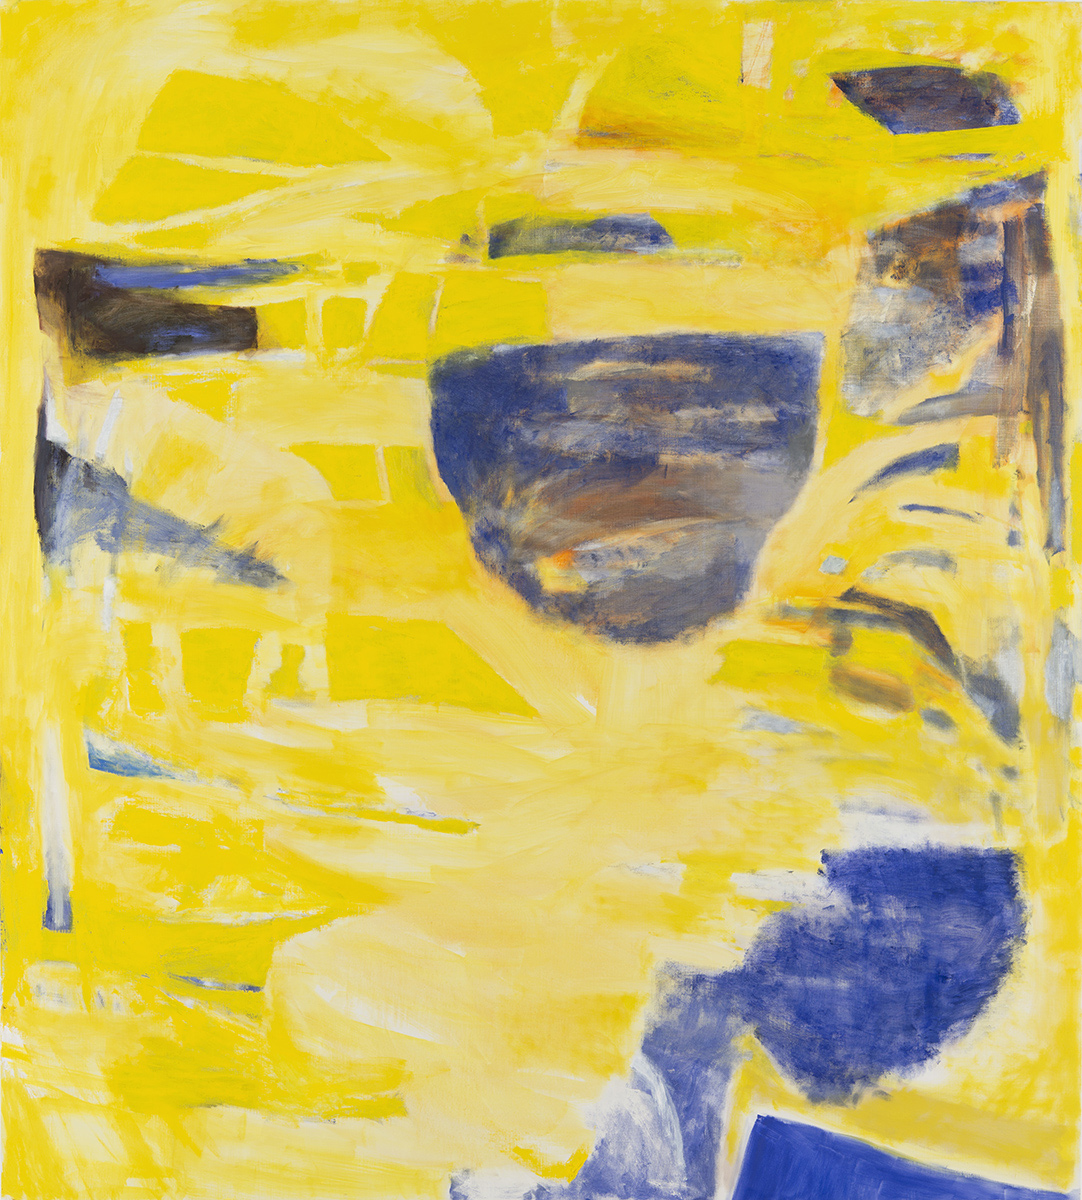 Breathing Yellow, 2016